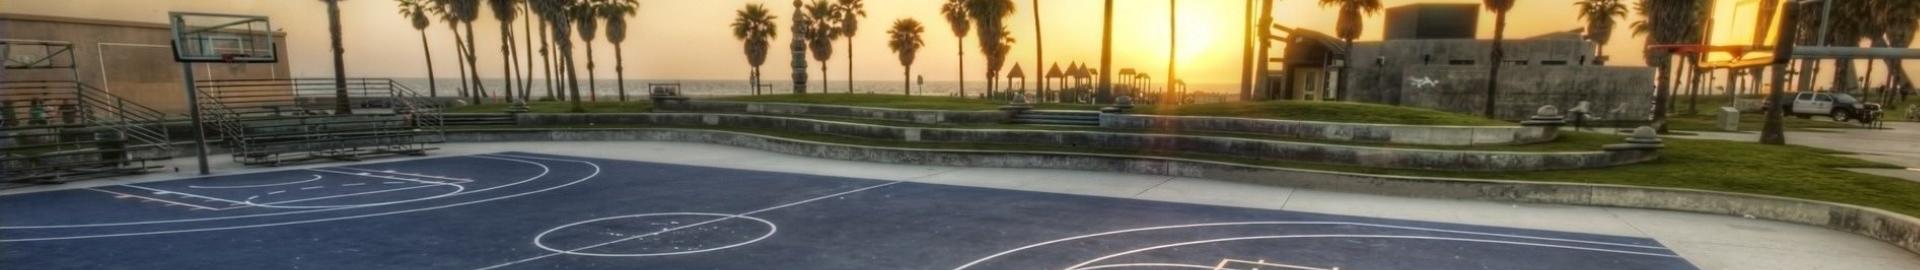 Scarpe da Basket | Basket Zone Siena